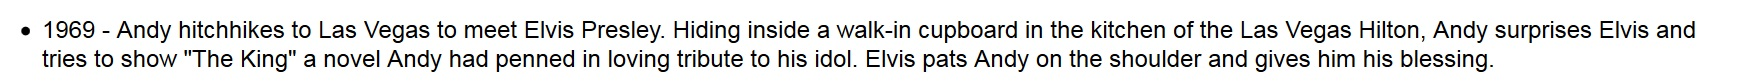 Andy Kaufman hitchhikes to Vegas to meet Elvis 1969